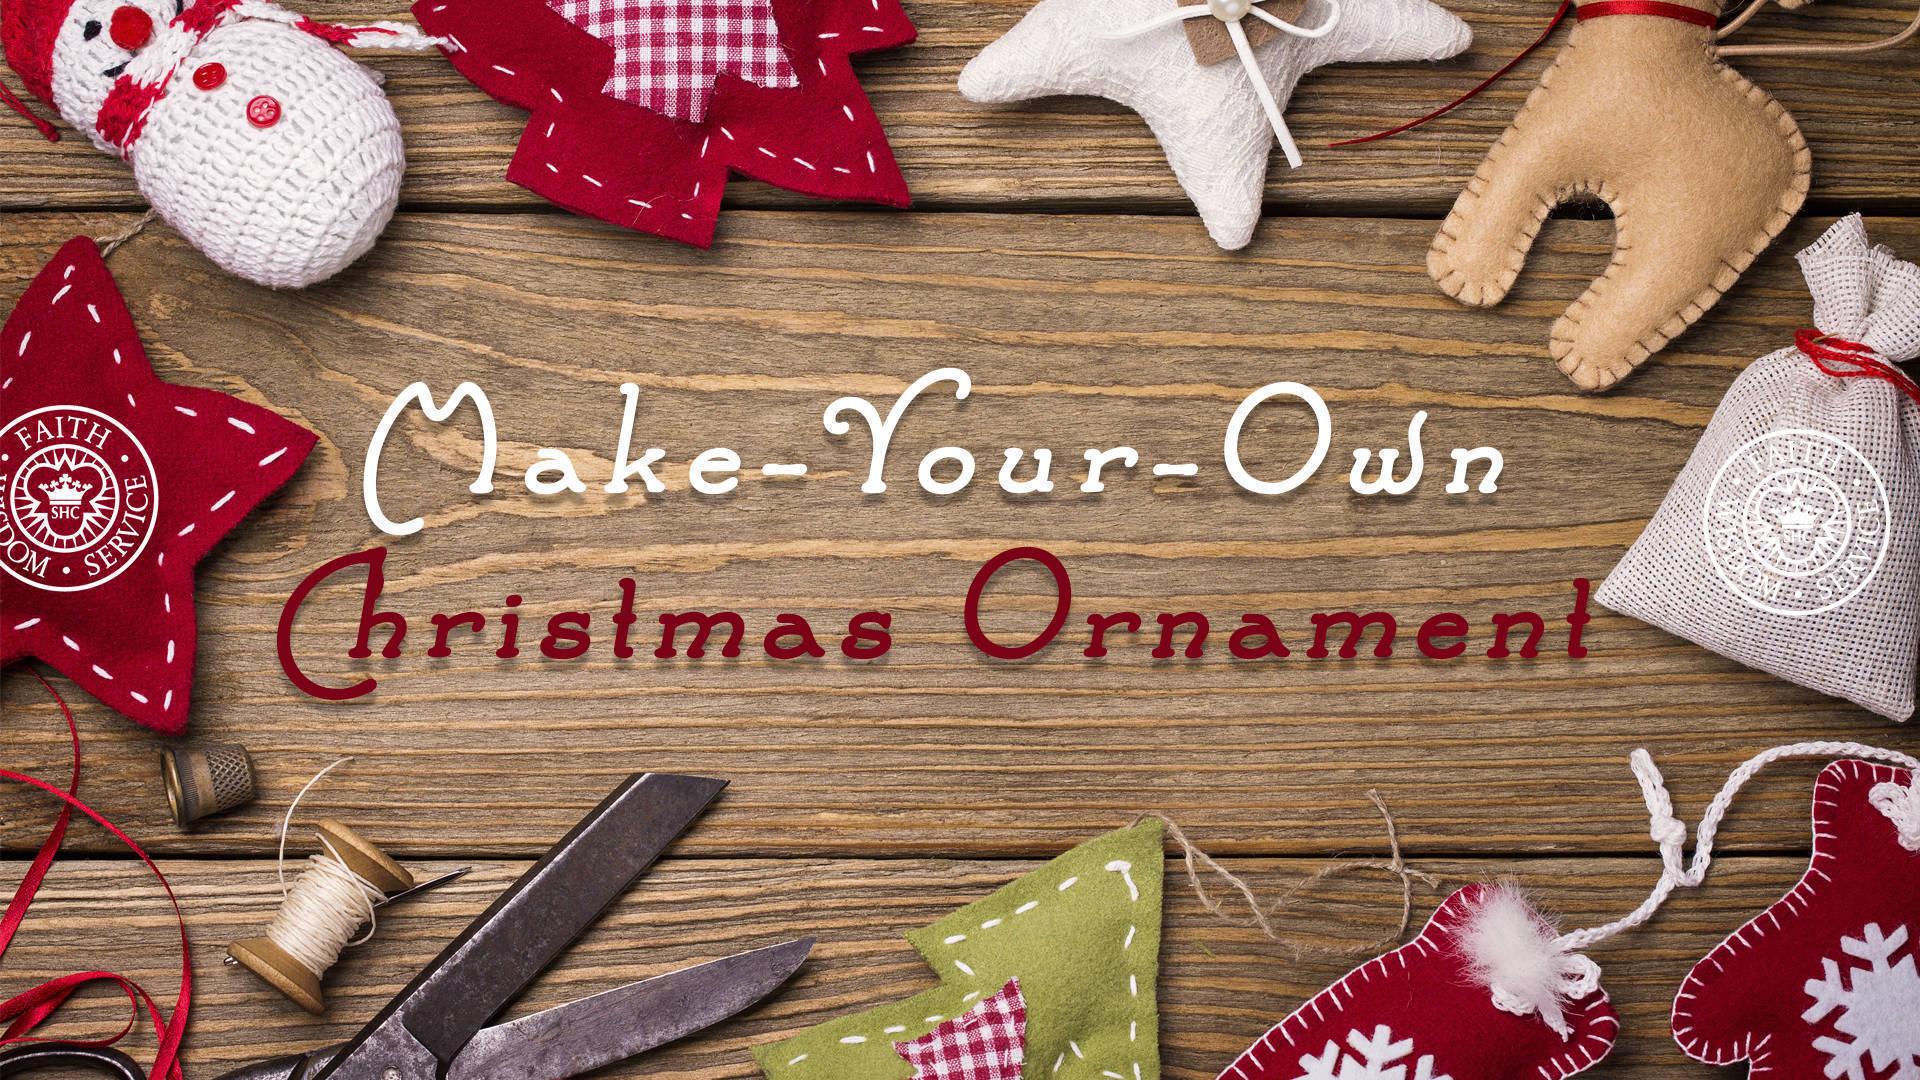 Make-Your-Own Christmas Ornament   TAPinto